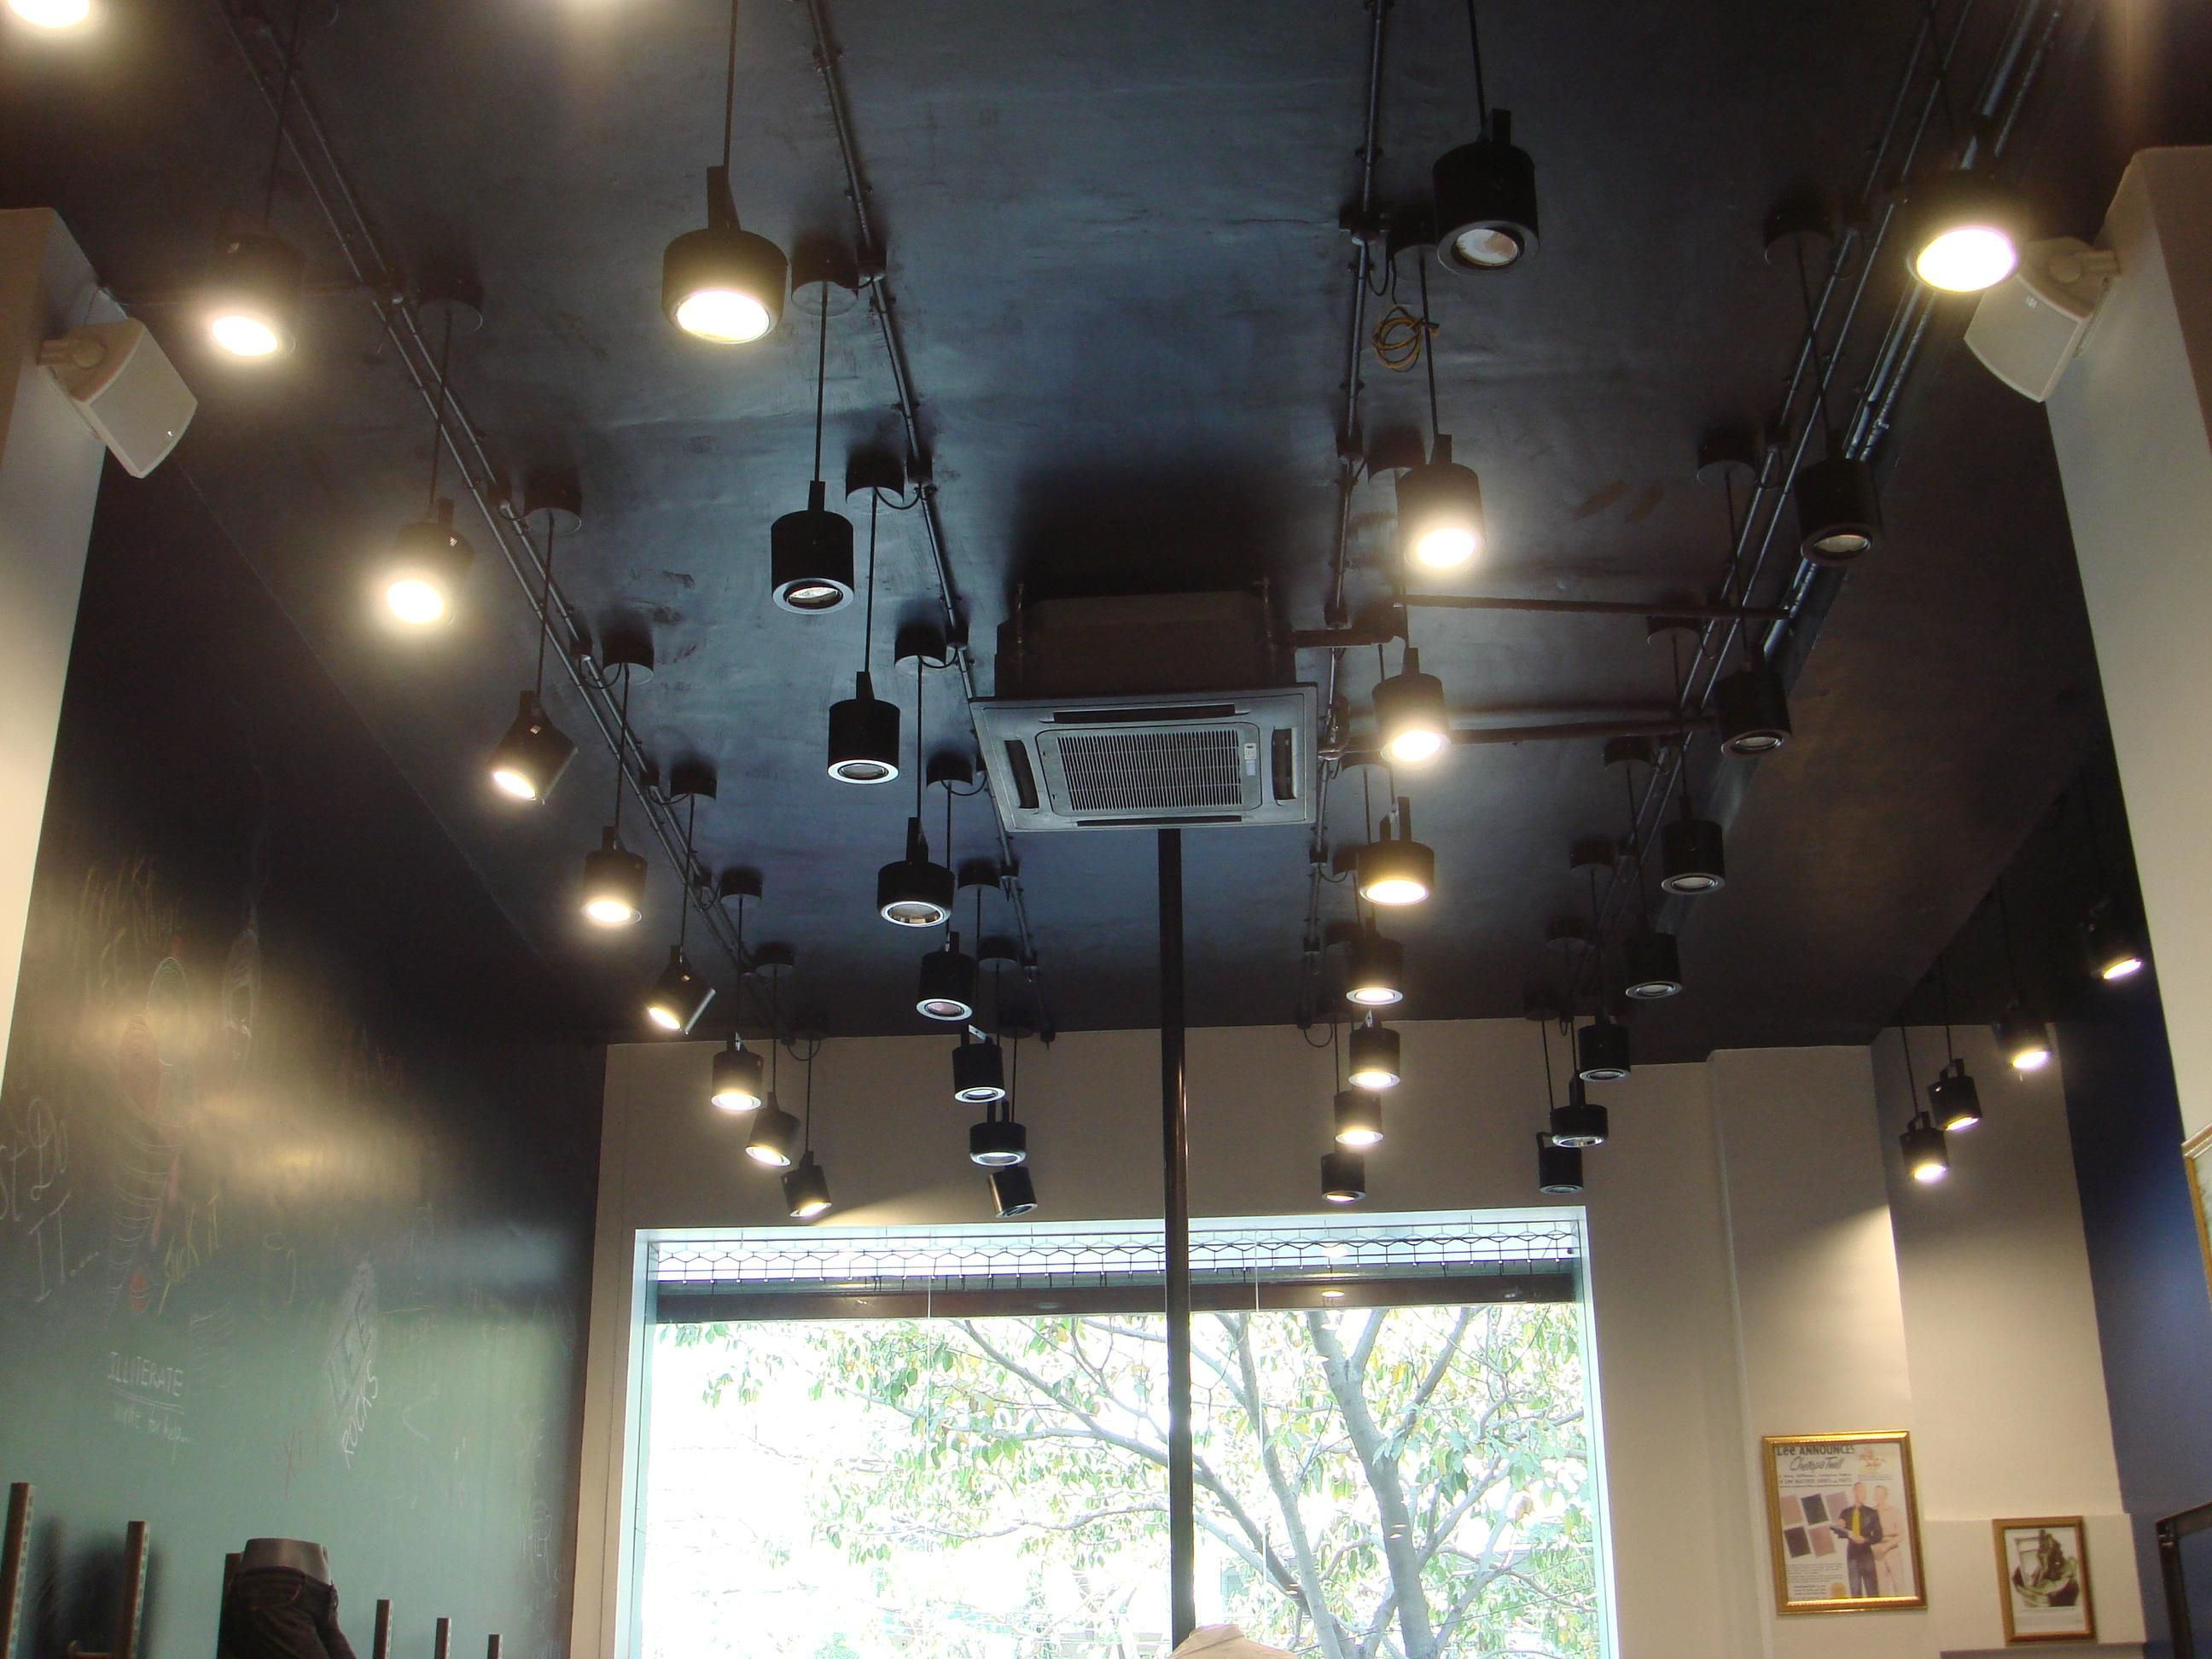 lighting showroom lighting ceiling lights